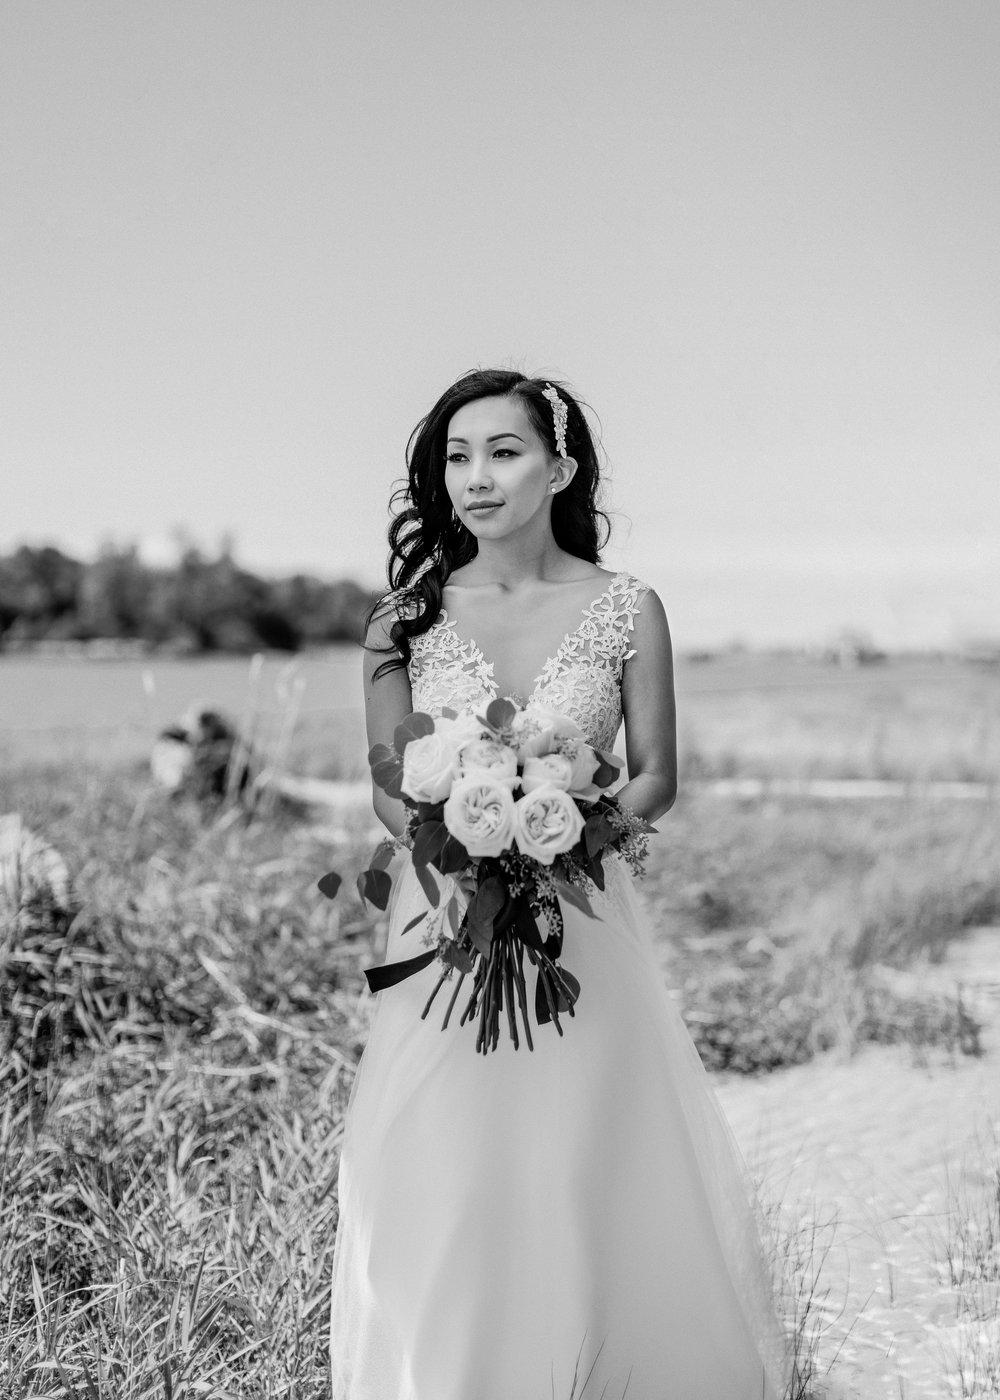 herastudios_wedding_betty_tomy_hera_selects-48.jpg